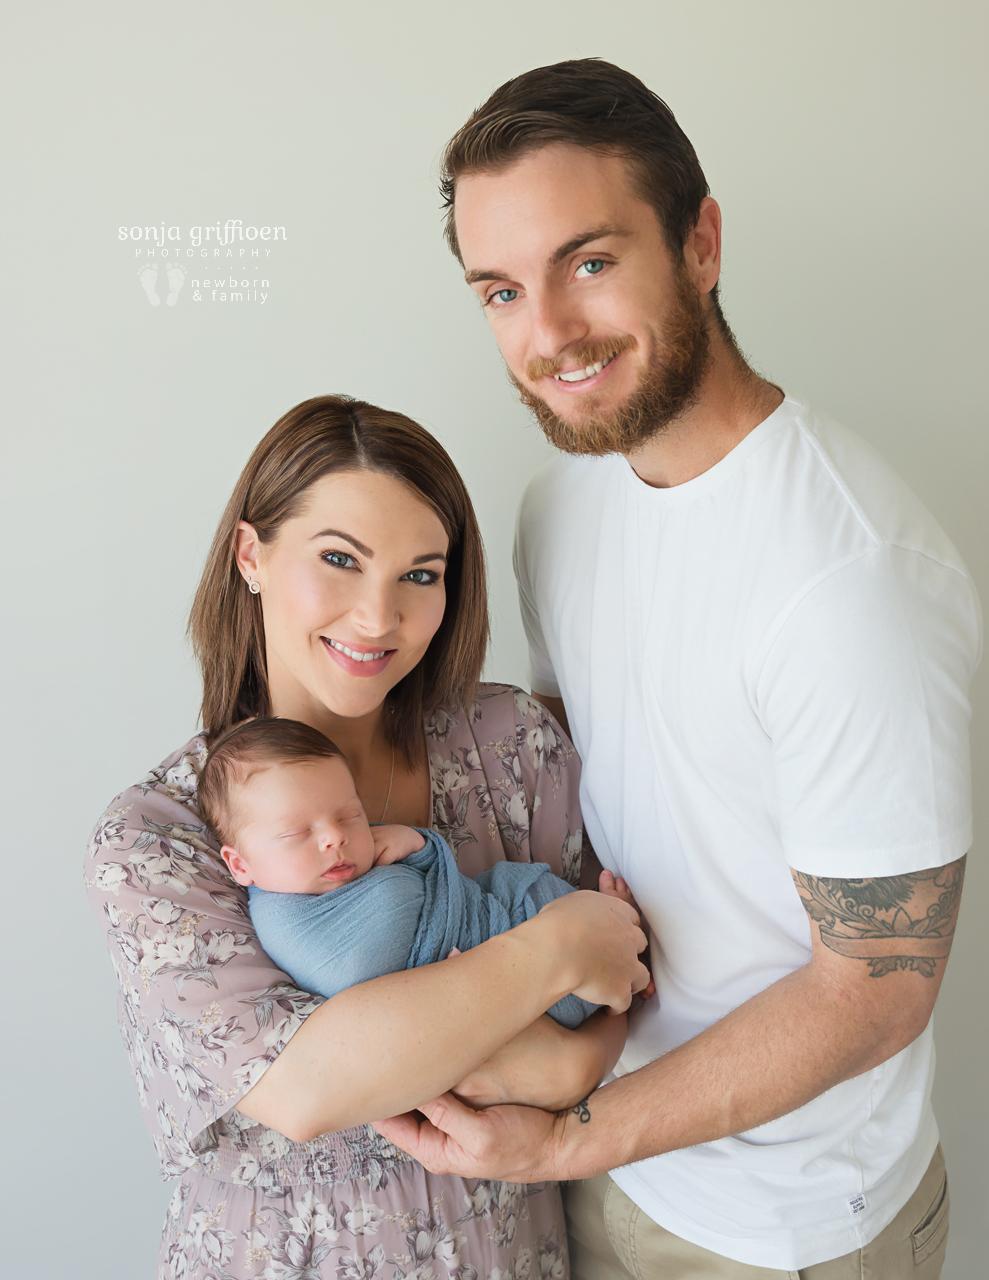 Lennox-Newborn-Brisbane-Newborn-Photographer-Sonja-Griffioen-09.jpg